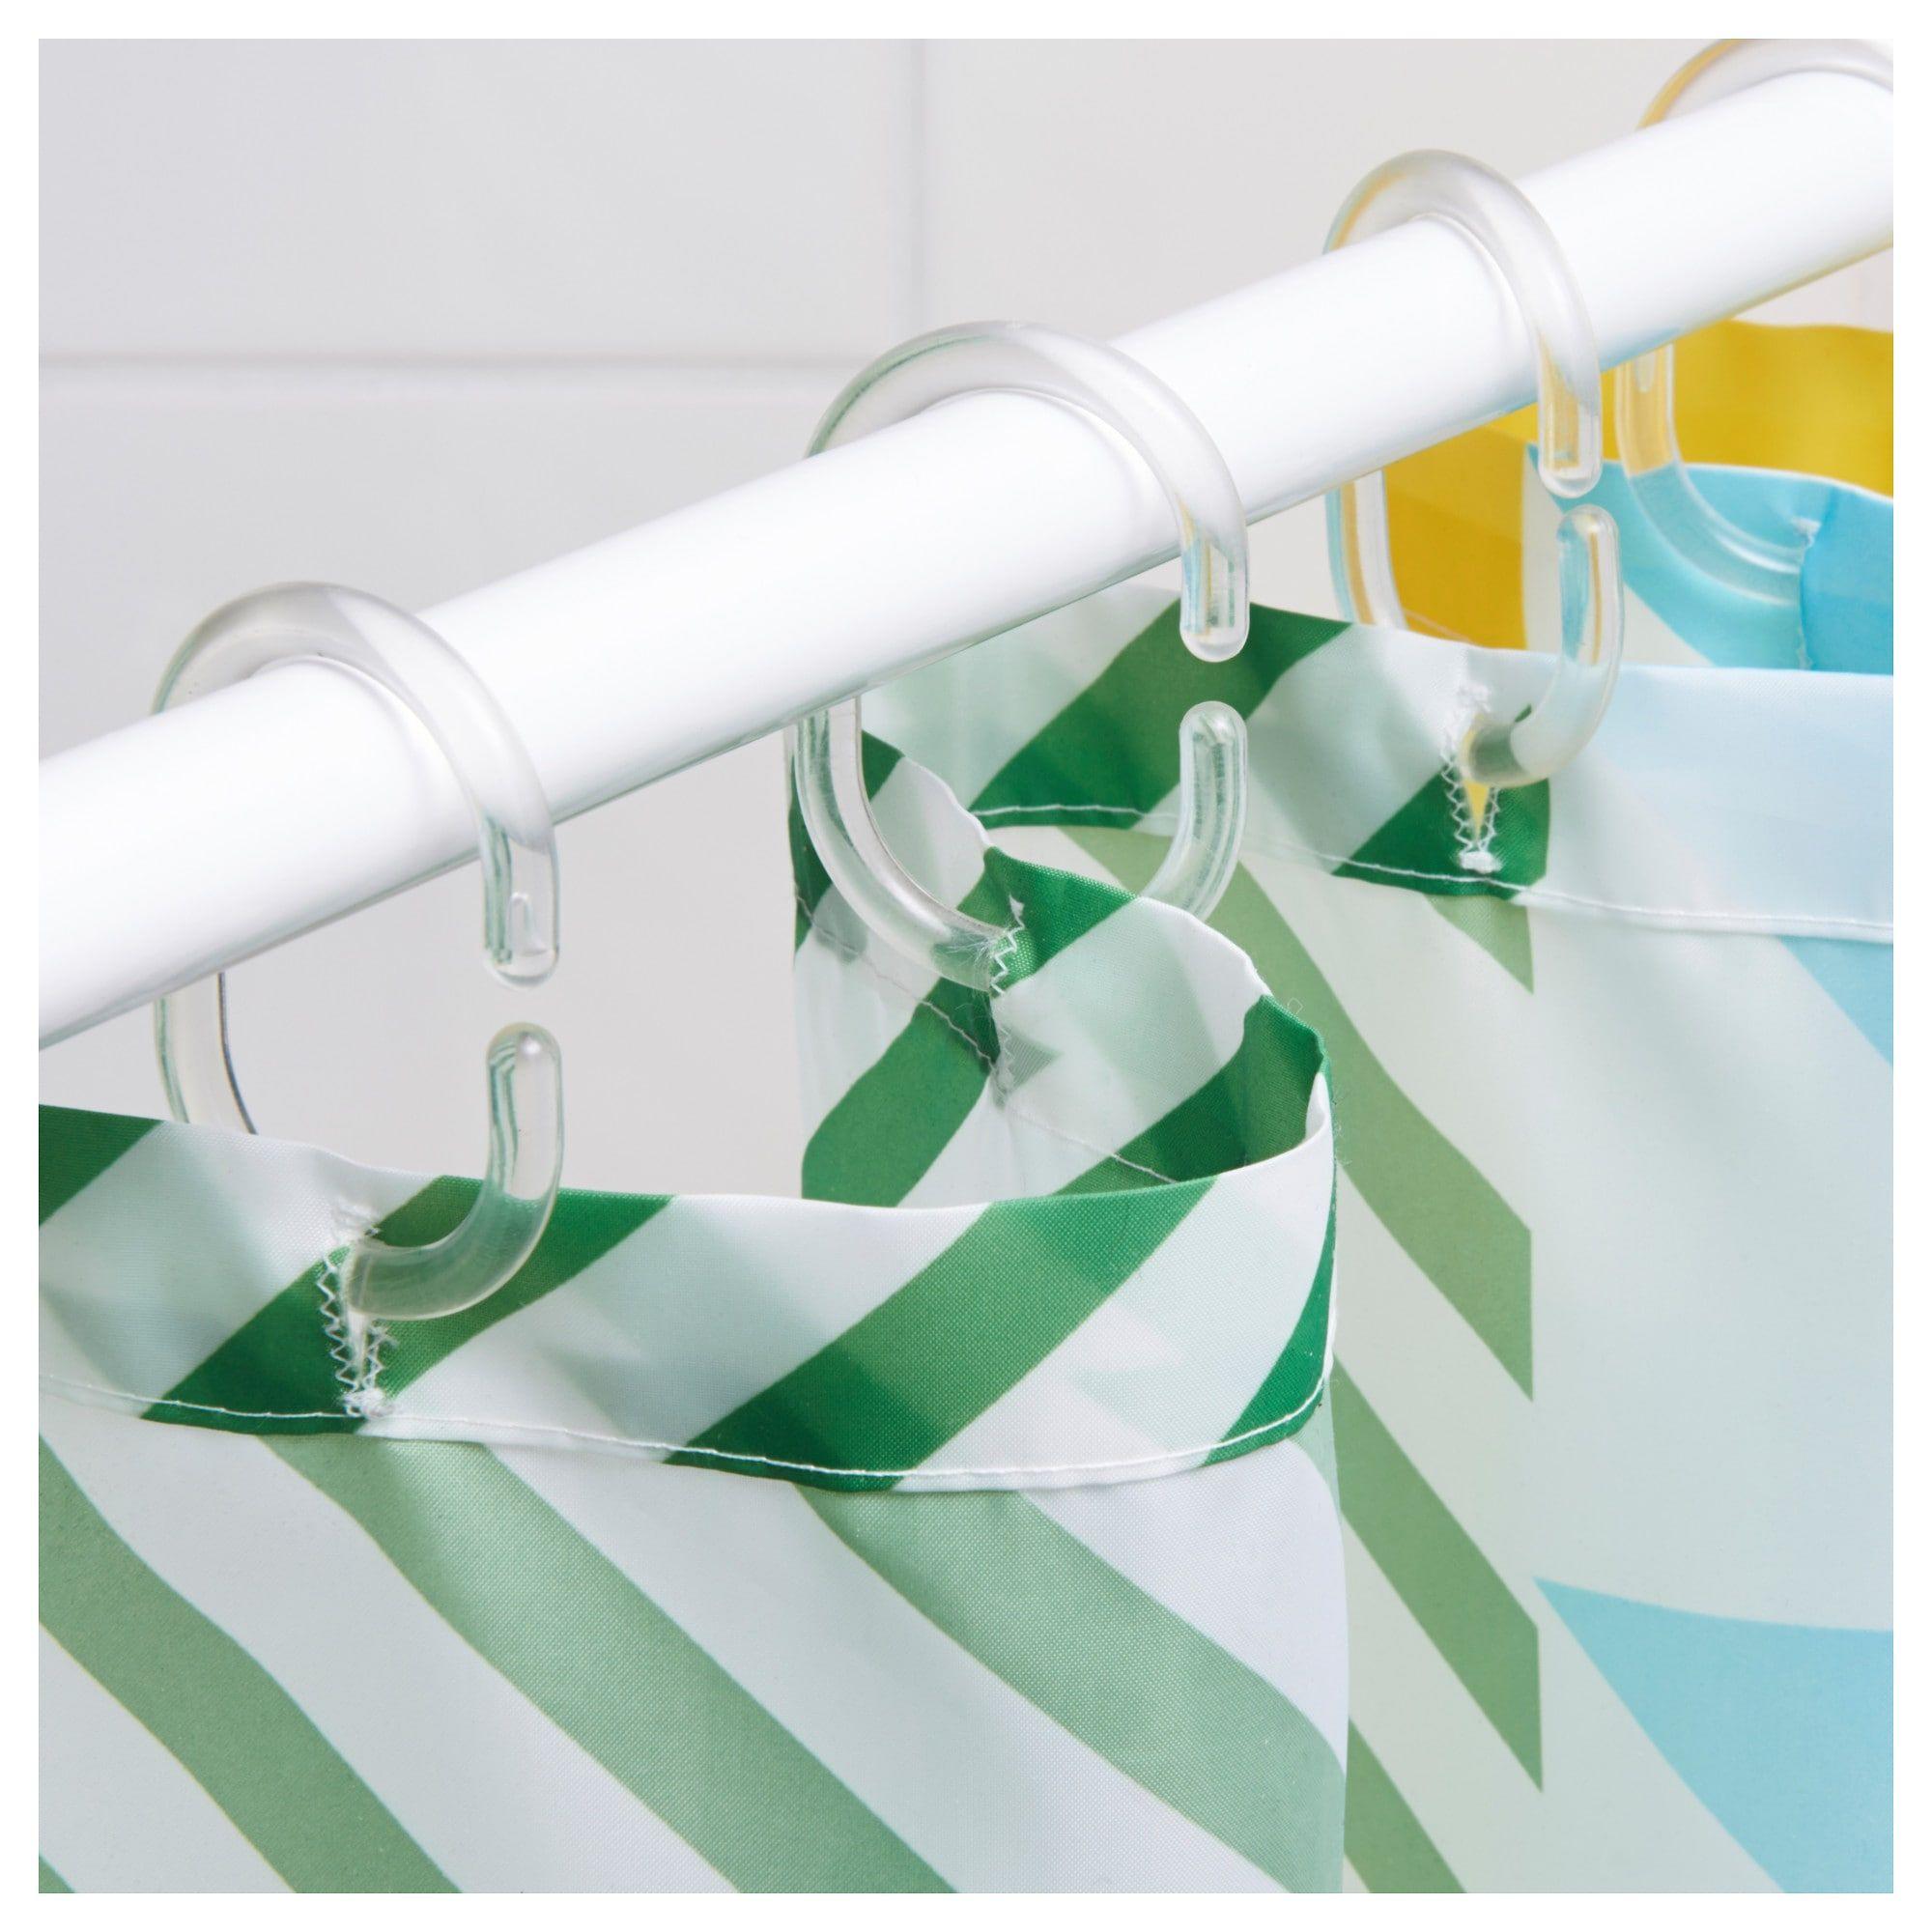 Ringsjon Shower Curtain Rings Clear Curtains With Rings Shower Curtain Rings Diy Shower